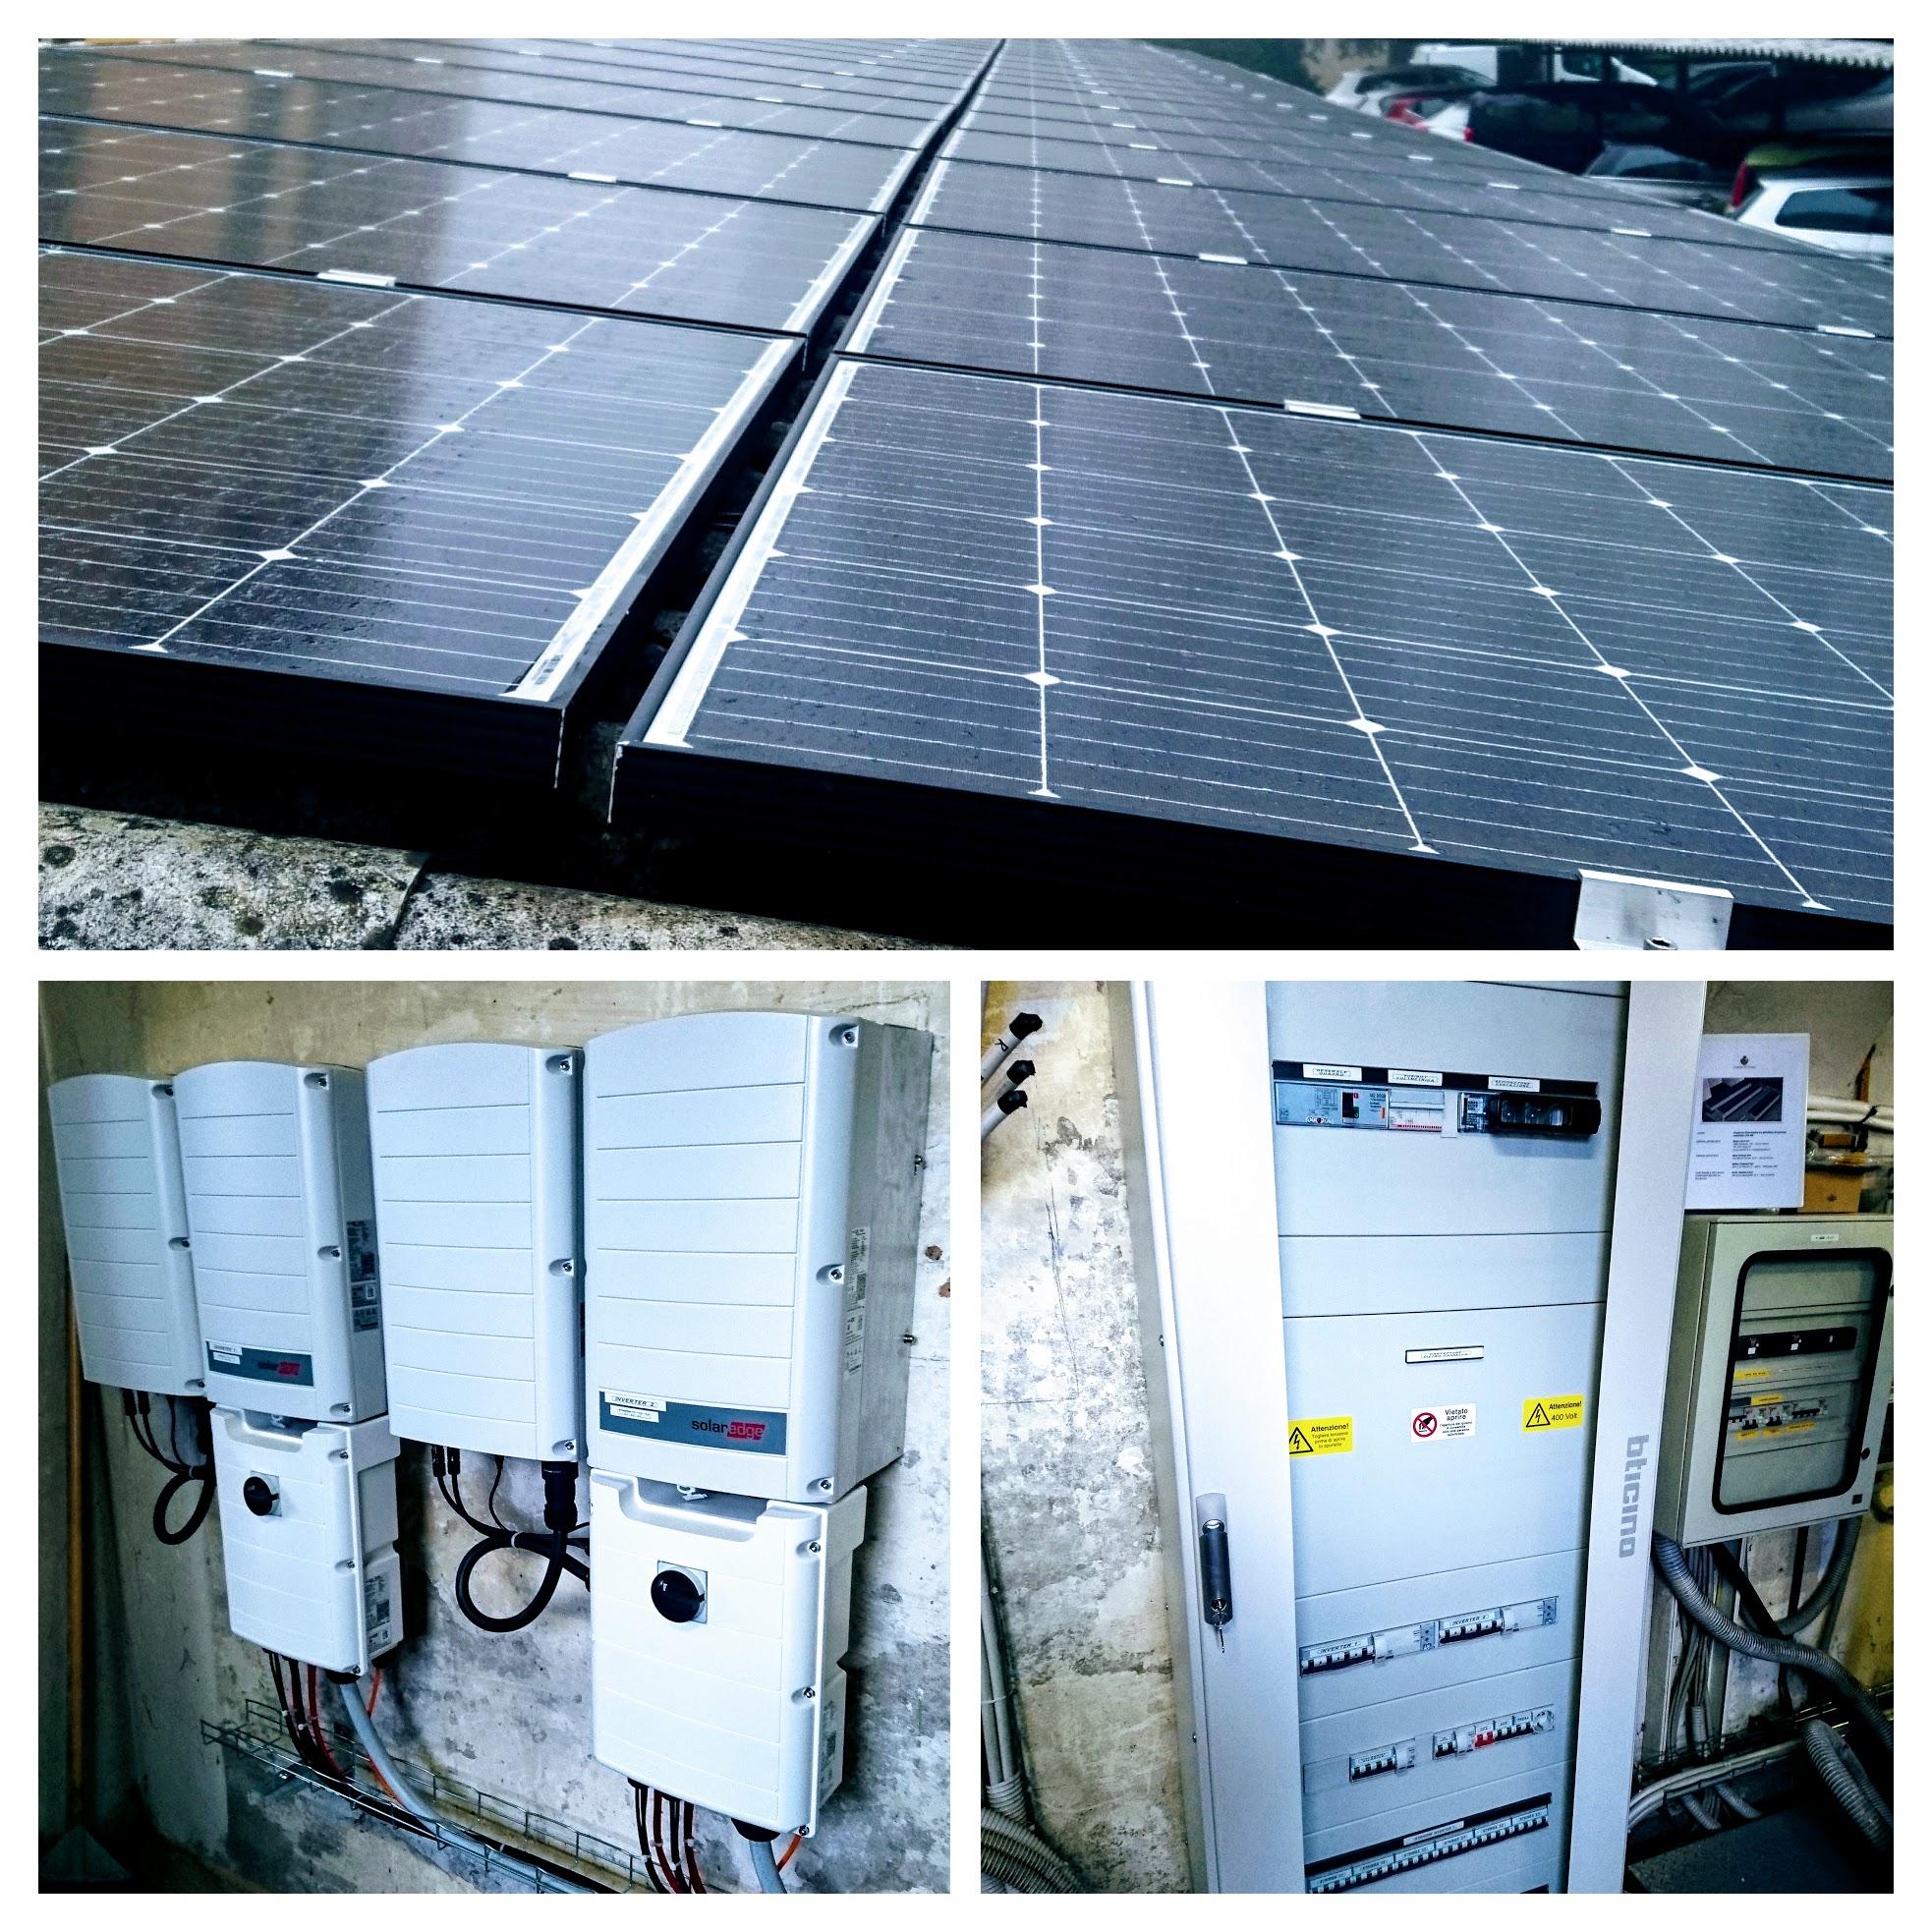 fotvoltaico-pensiline-parma